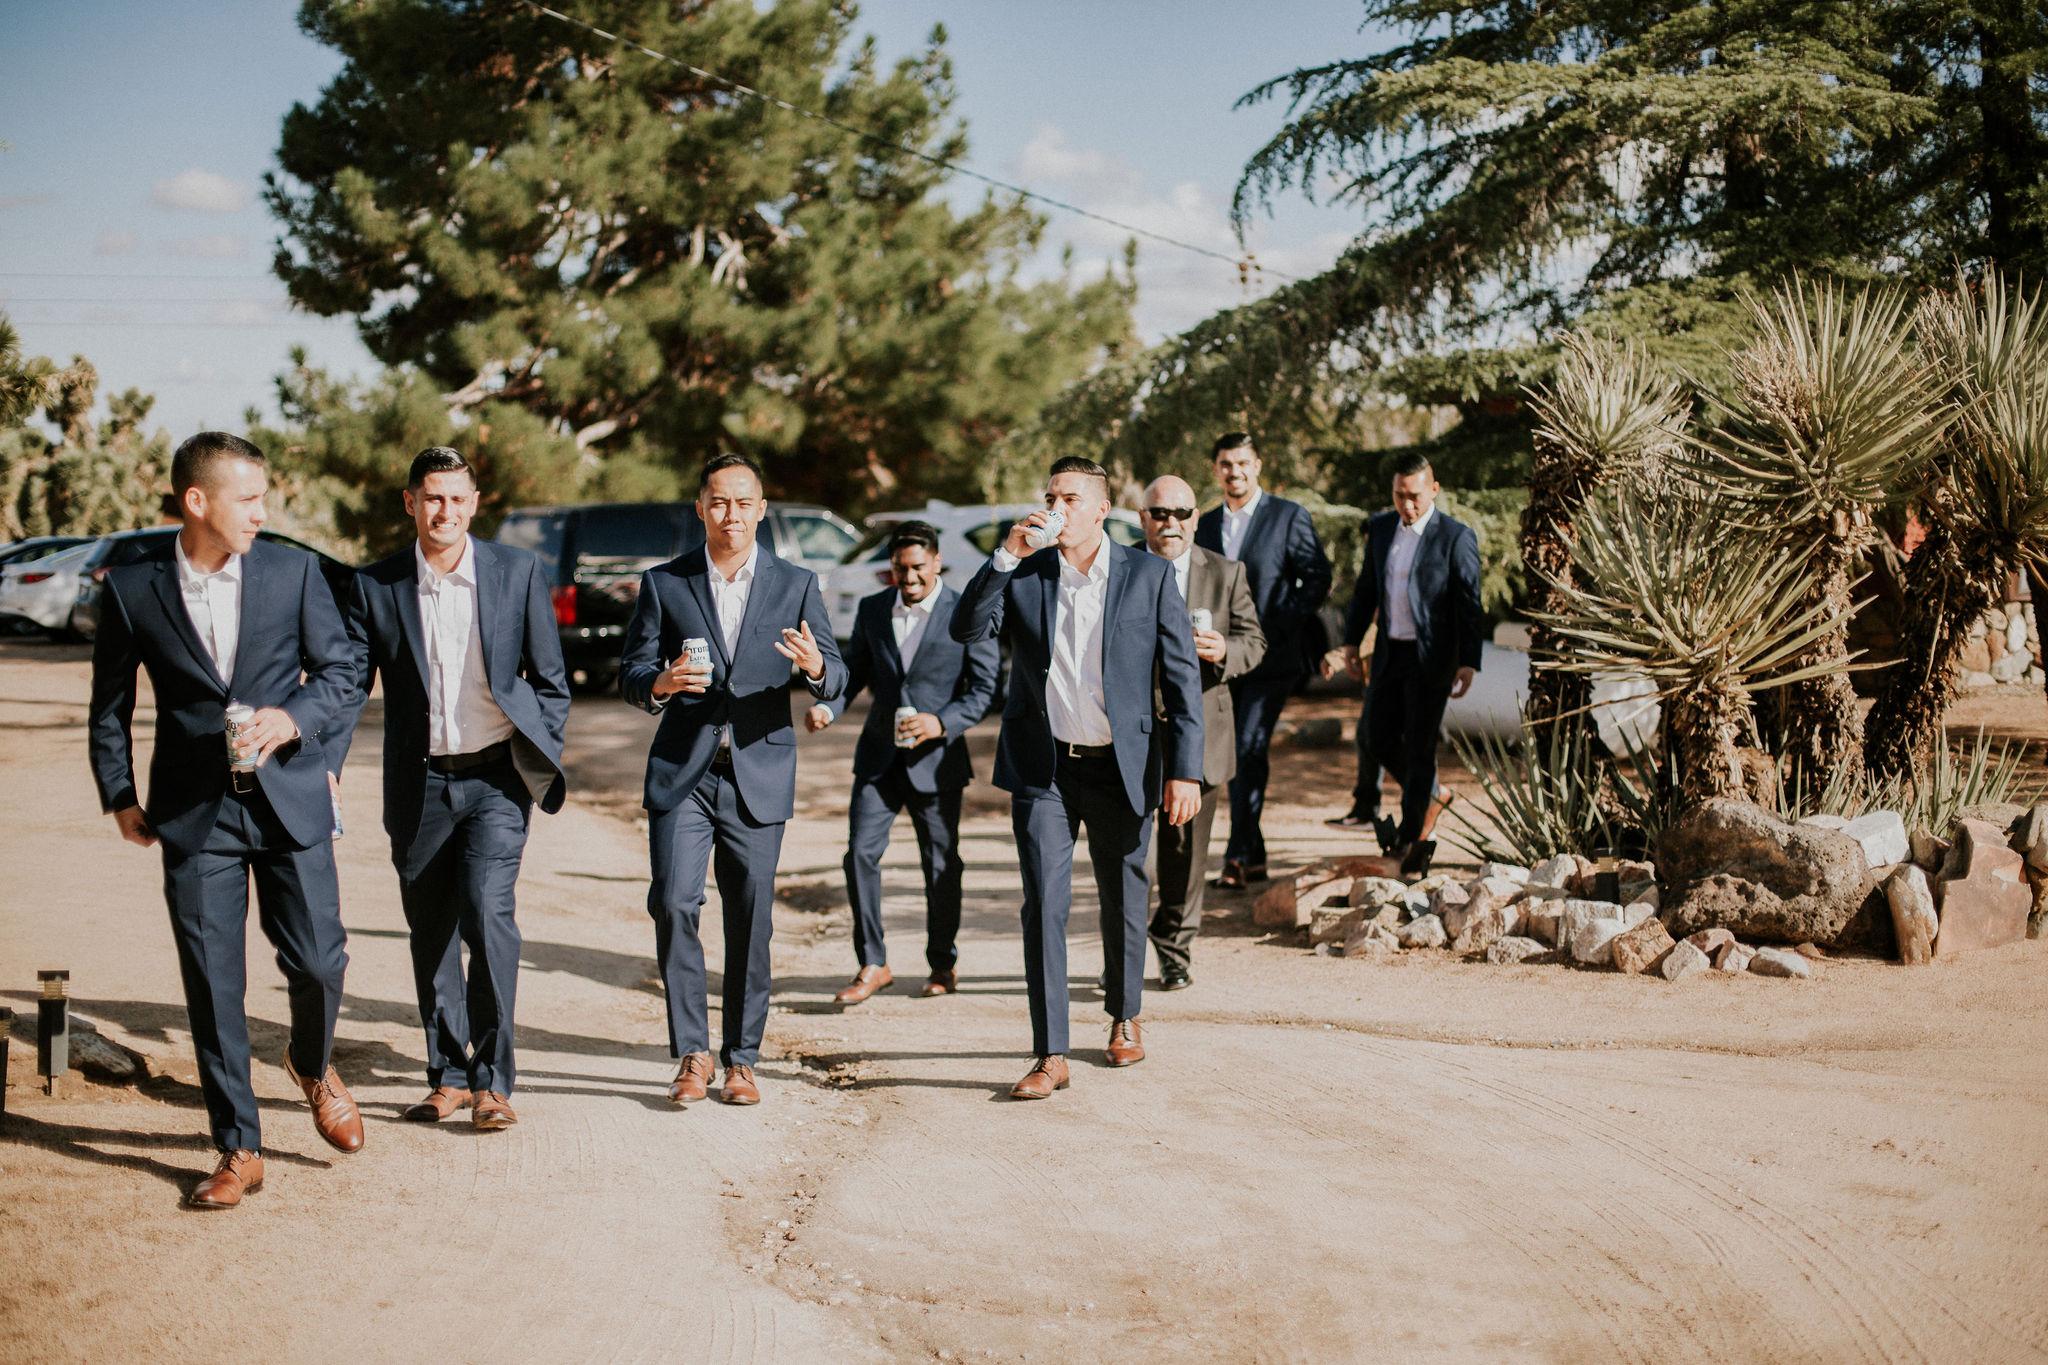 RimrockRanch-JoshuaTree-Wedding-Jami-Laree-149.jpg